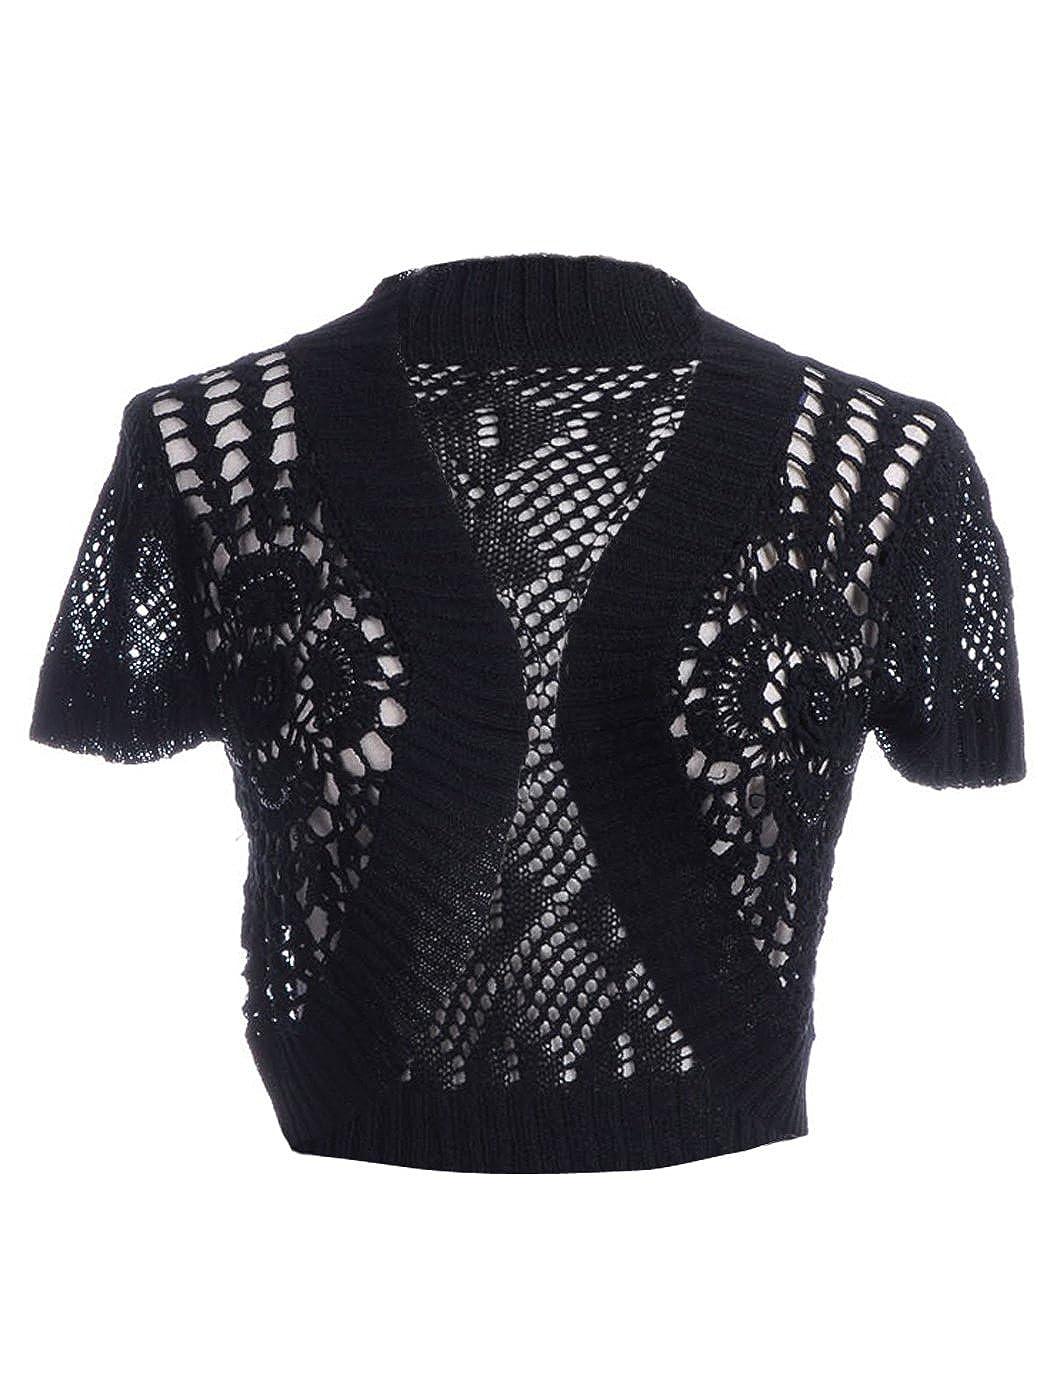 e0a653d2e70c Anna-Kaci S/M Fit Black Diamond and Floral Pattern Crochet Knit Beaded  Cardigan: Amazon.co.uk: Clothing